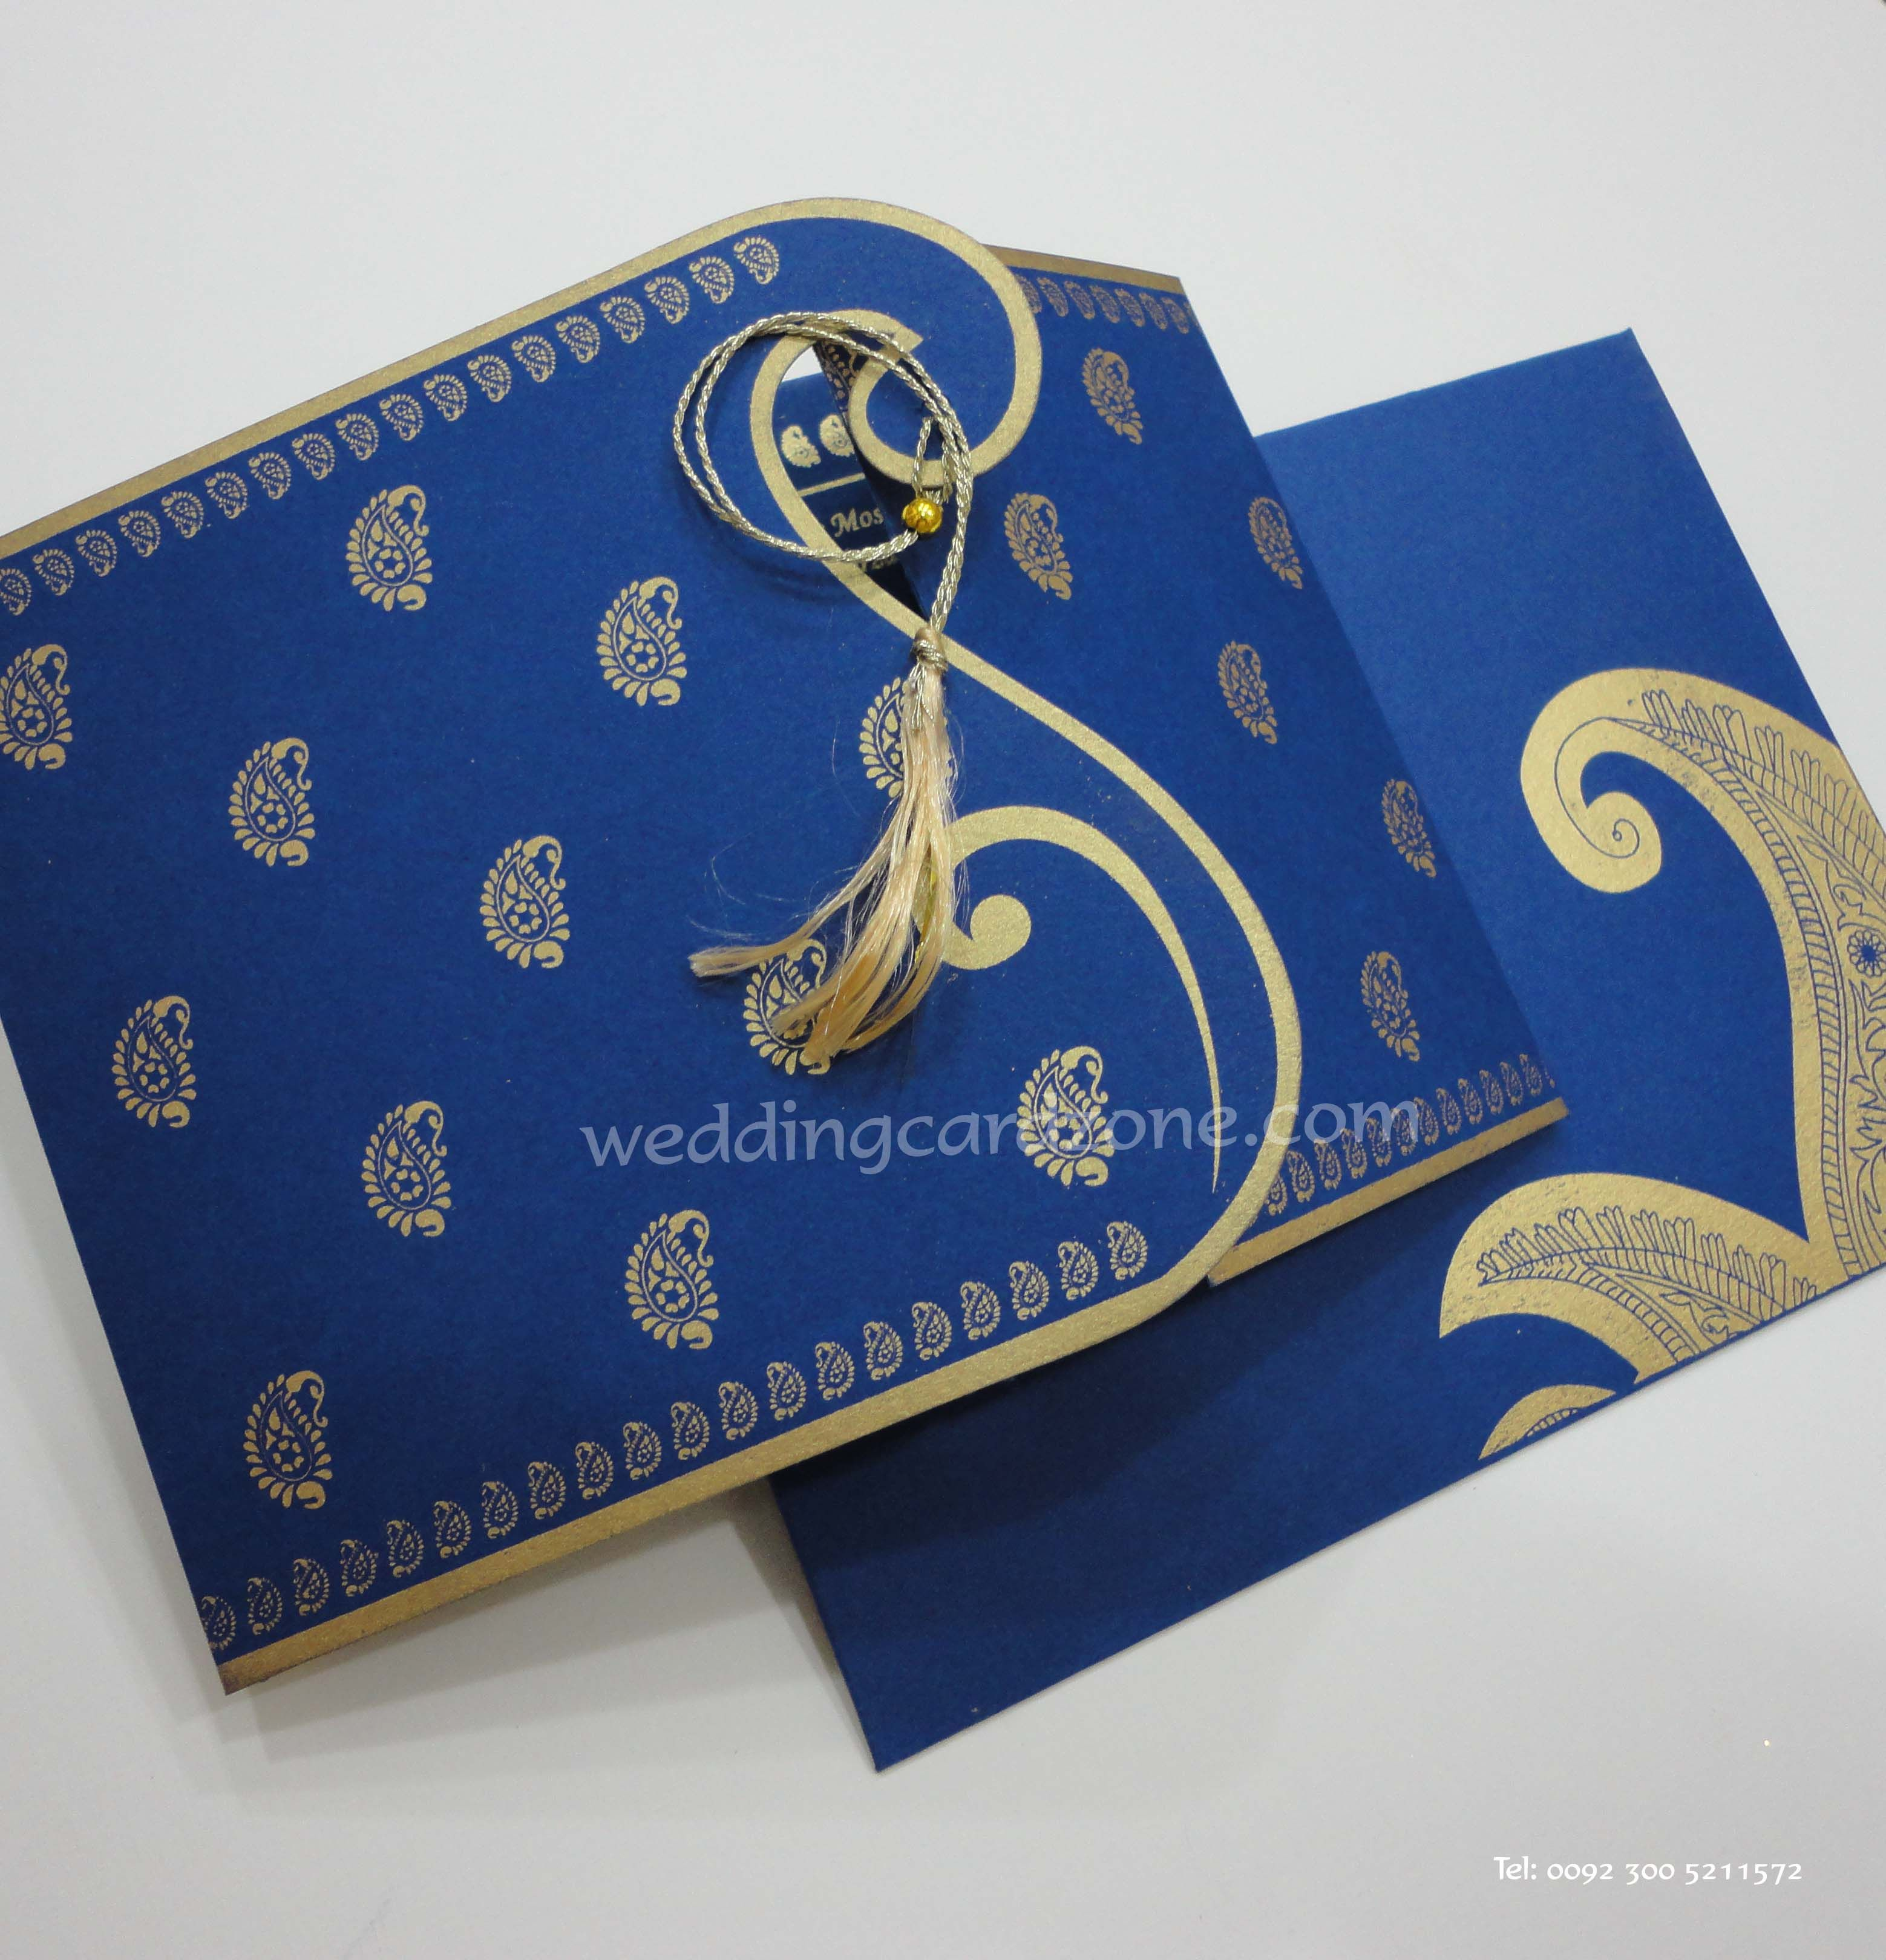 scroll wedding invitations Pakistani Wedding cards Wedding Cards Collection Pakistan Muslim Wedding cards Scroll invitations